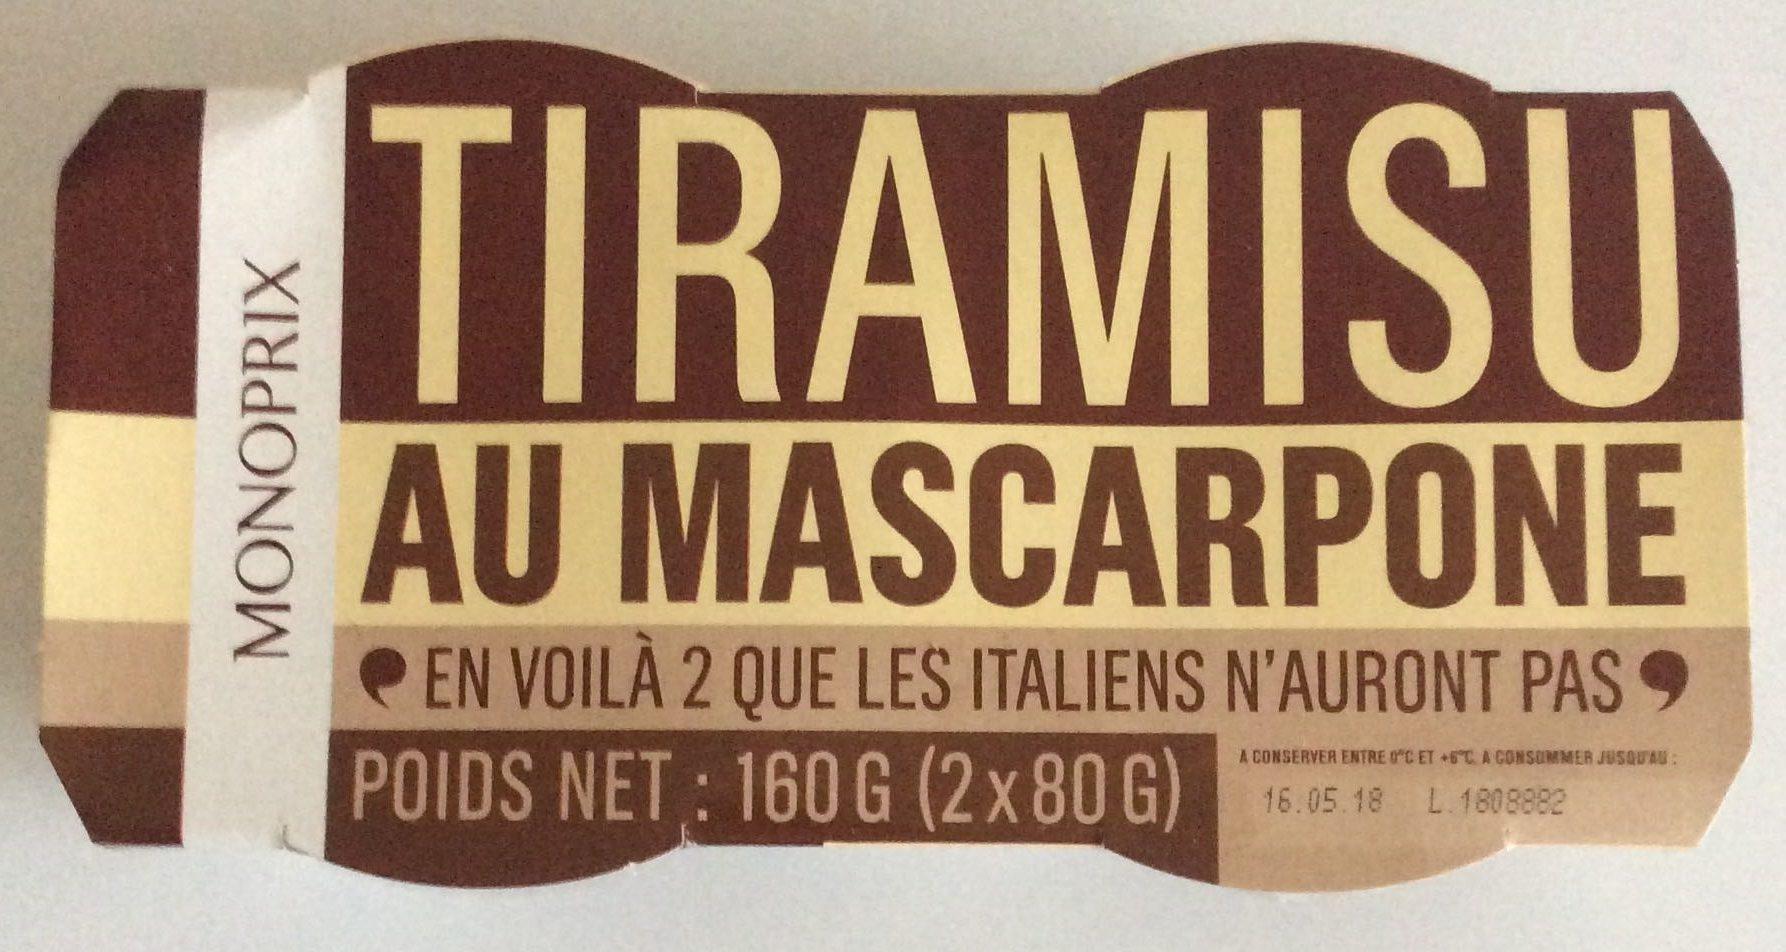 Tiramisu au mascarpone - Produit